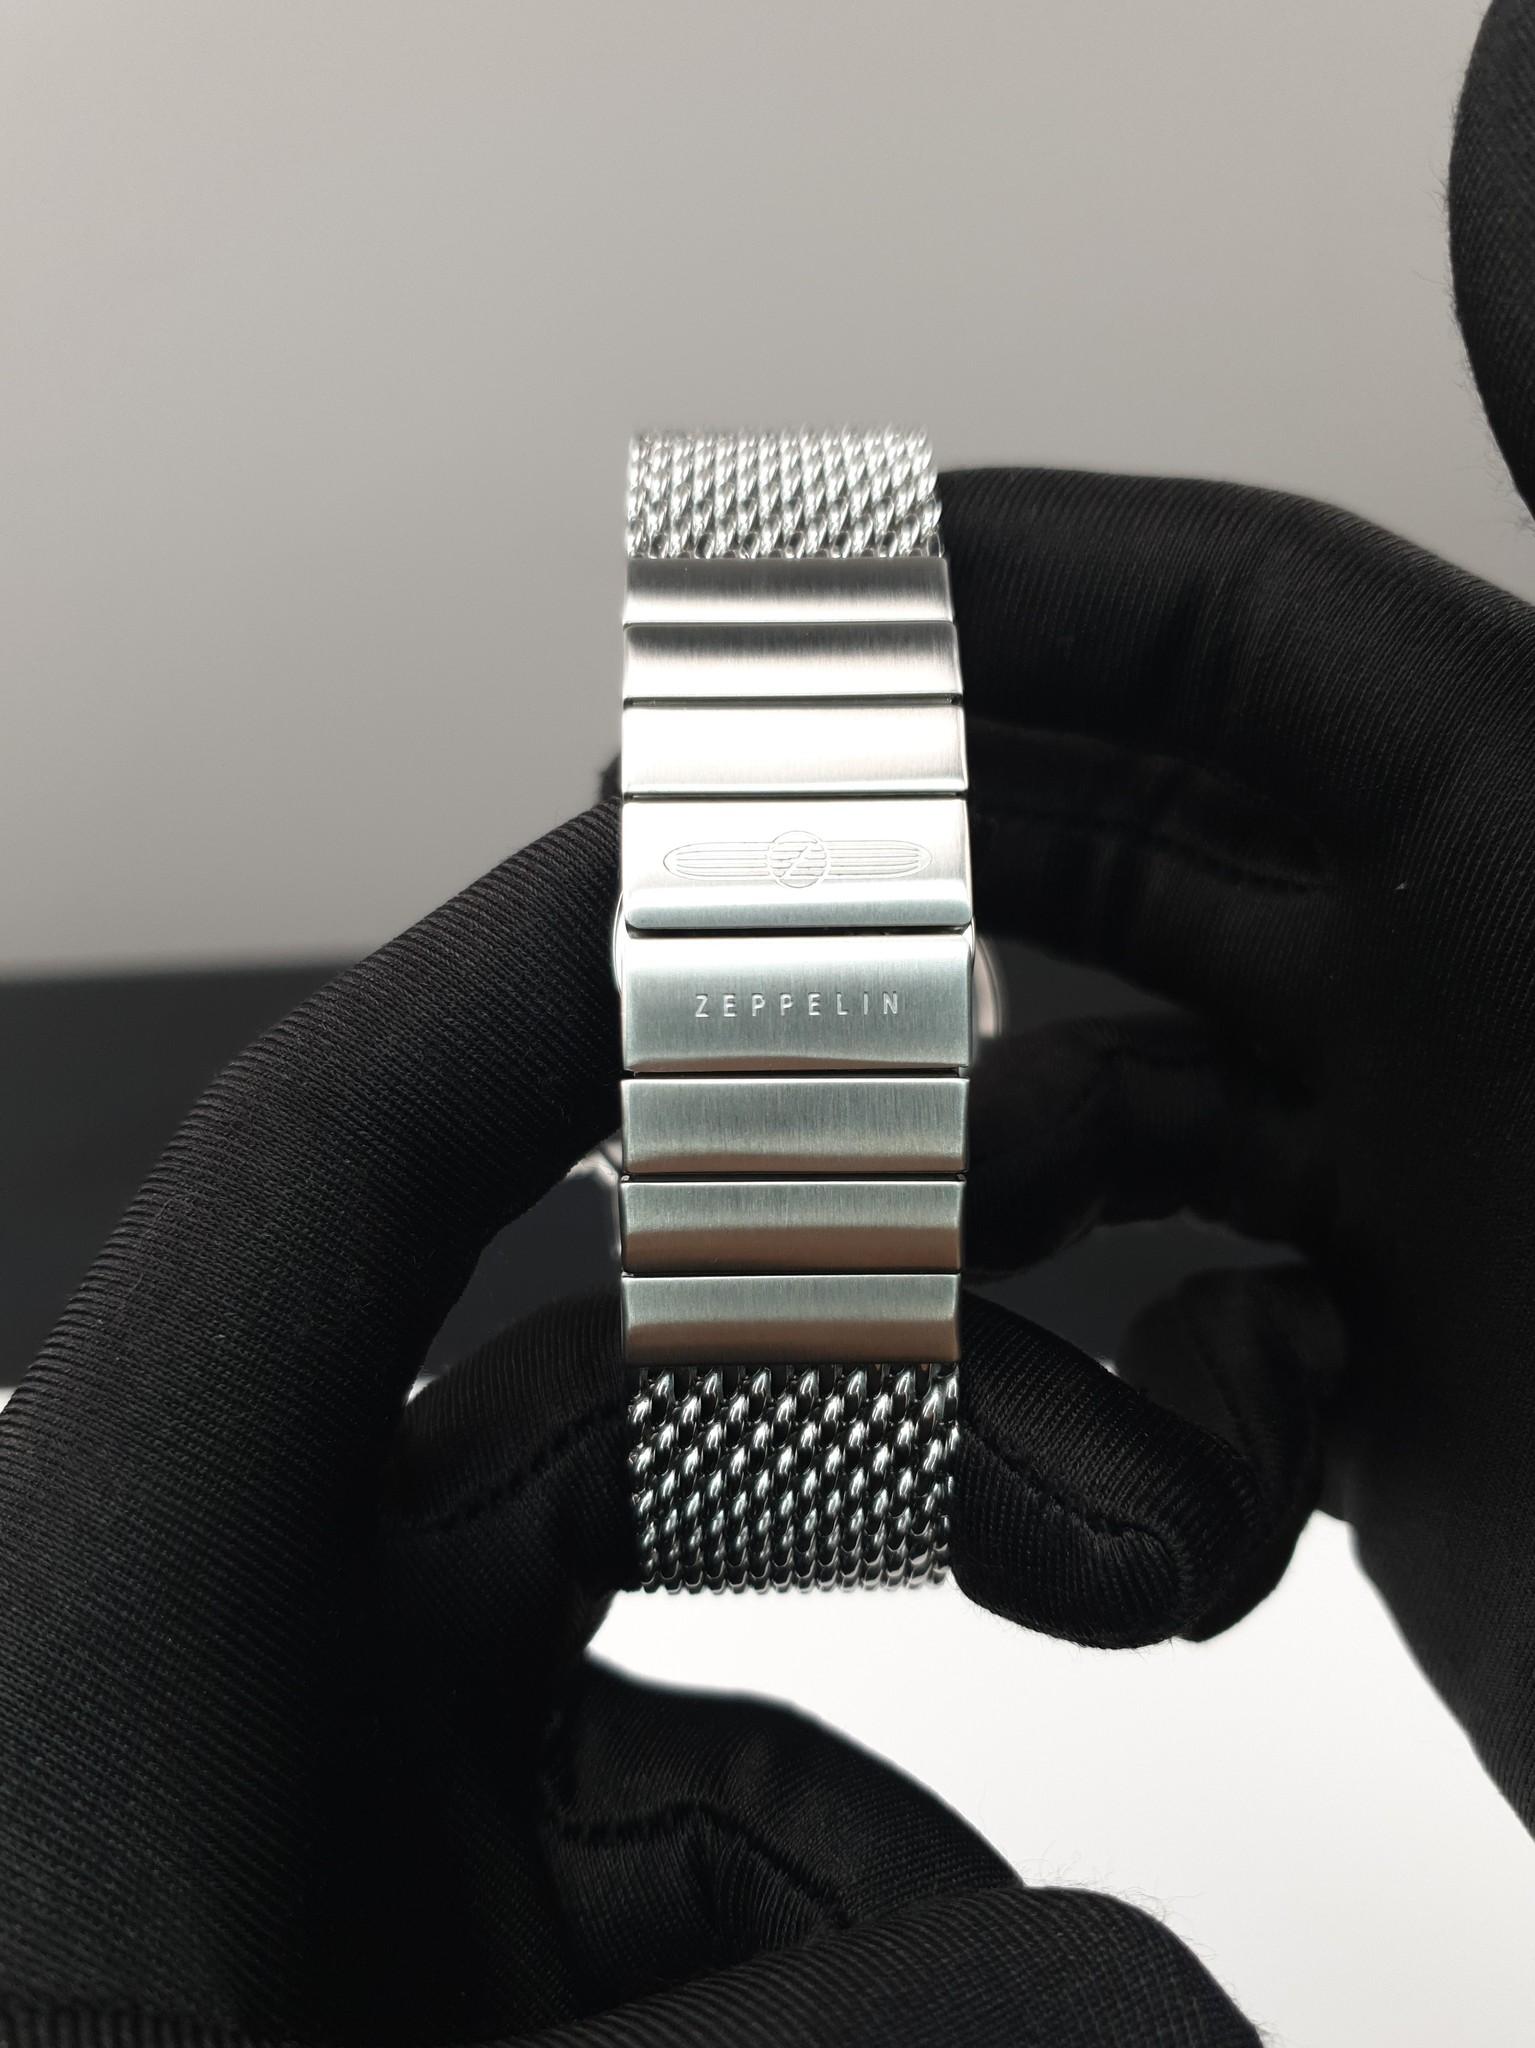 Мужские часы Zeppelin Jahre Chrono 8680M3